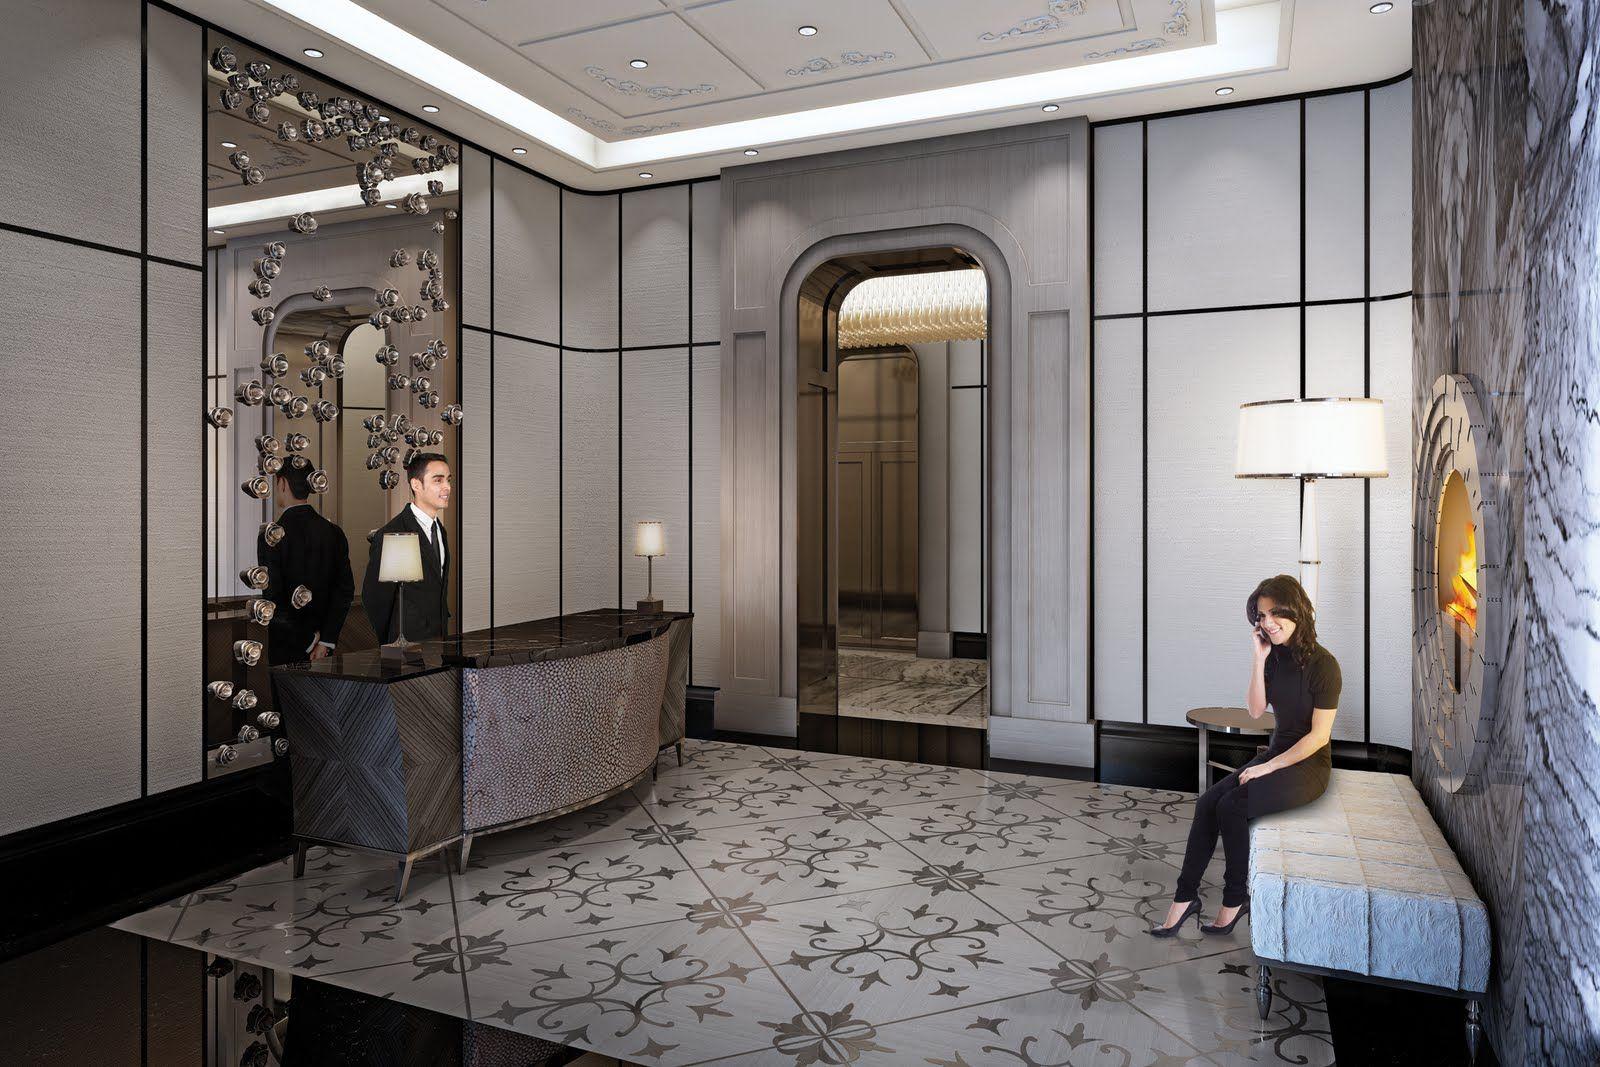 Bisha Hotel Hotel Lobby Design Hotel Reception Desk Hotel Interior Design